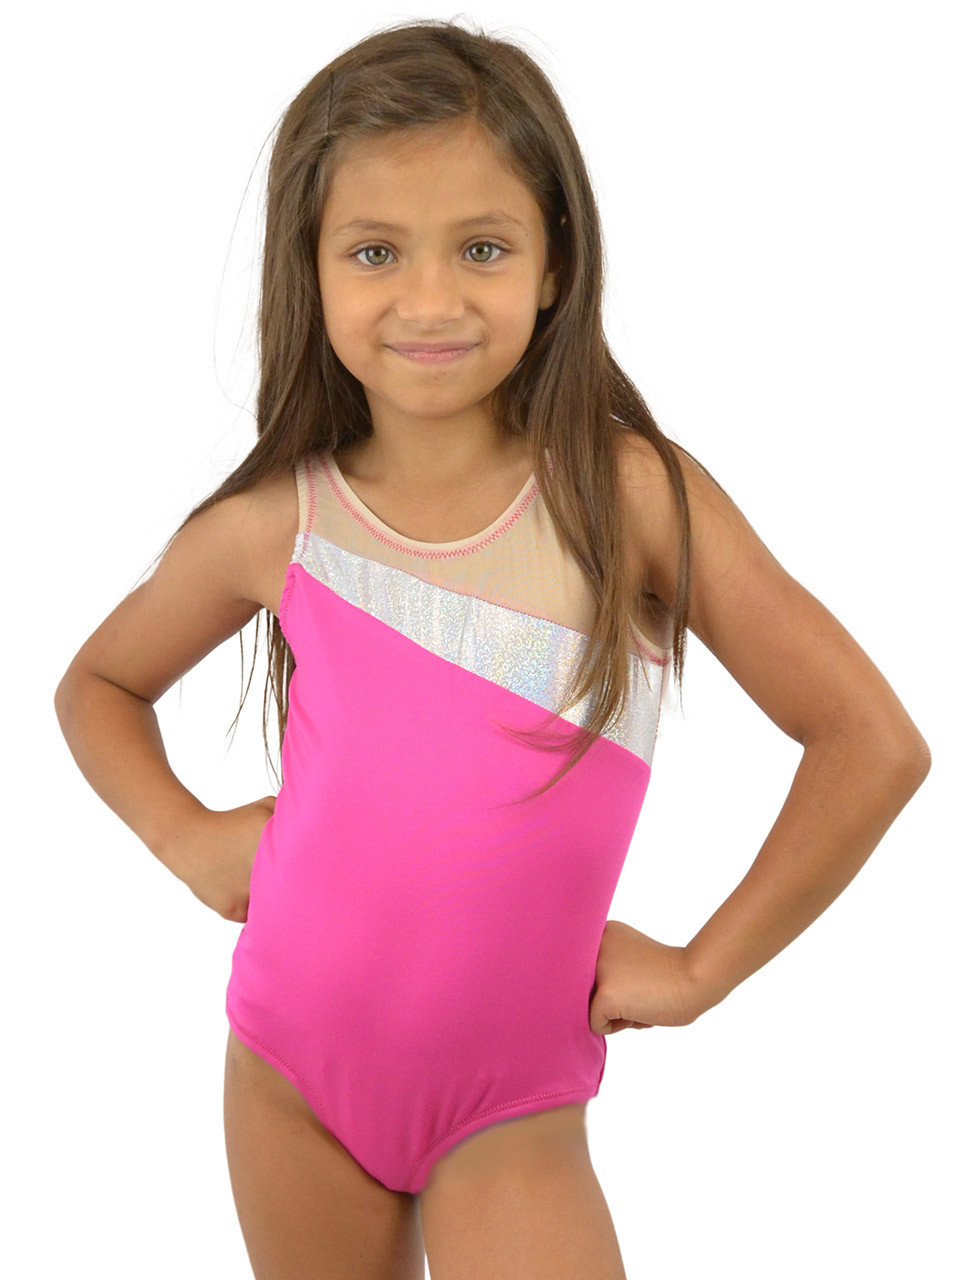 83390f986d4 Vivian s Fashions Dancewear - Girls Glitter Panel Sleeveless Leotard ...